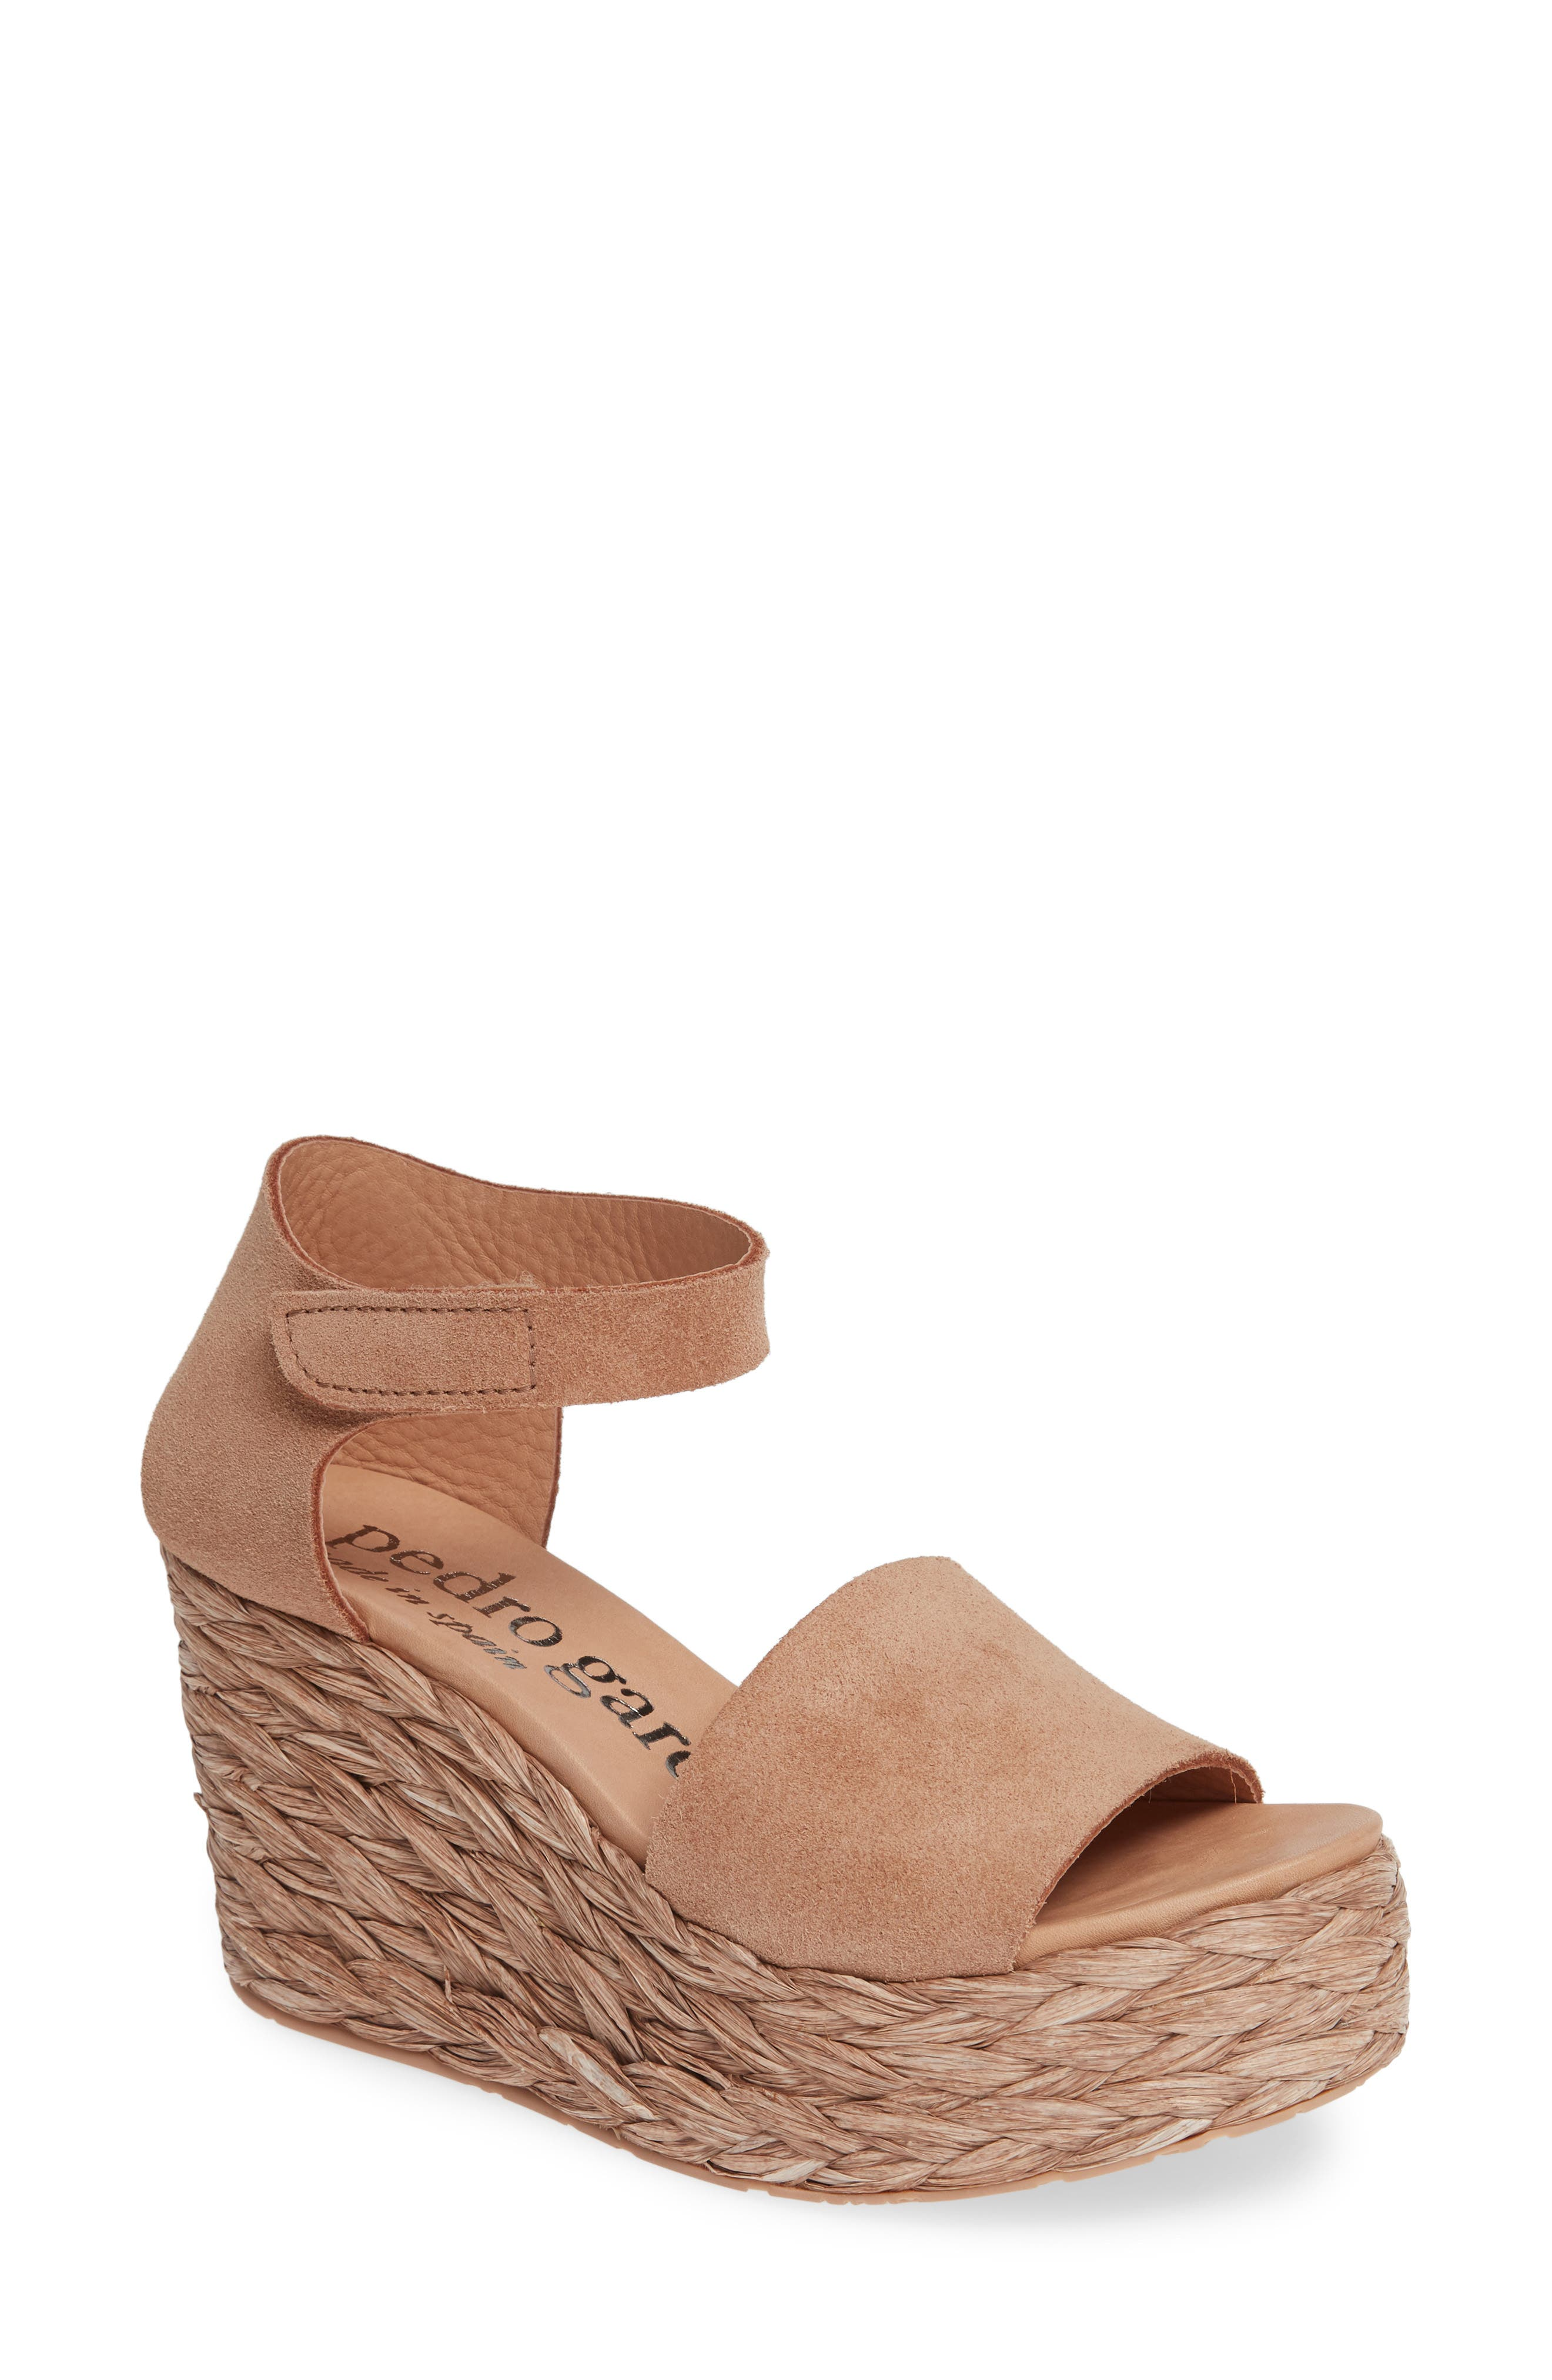 PEDRO GARCIA Dory Suede Low-Wedge Espadrille Sandals in Rose Castoro